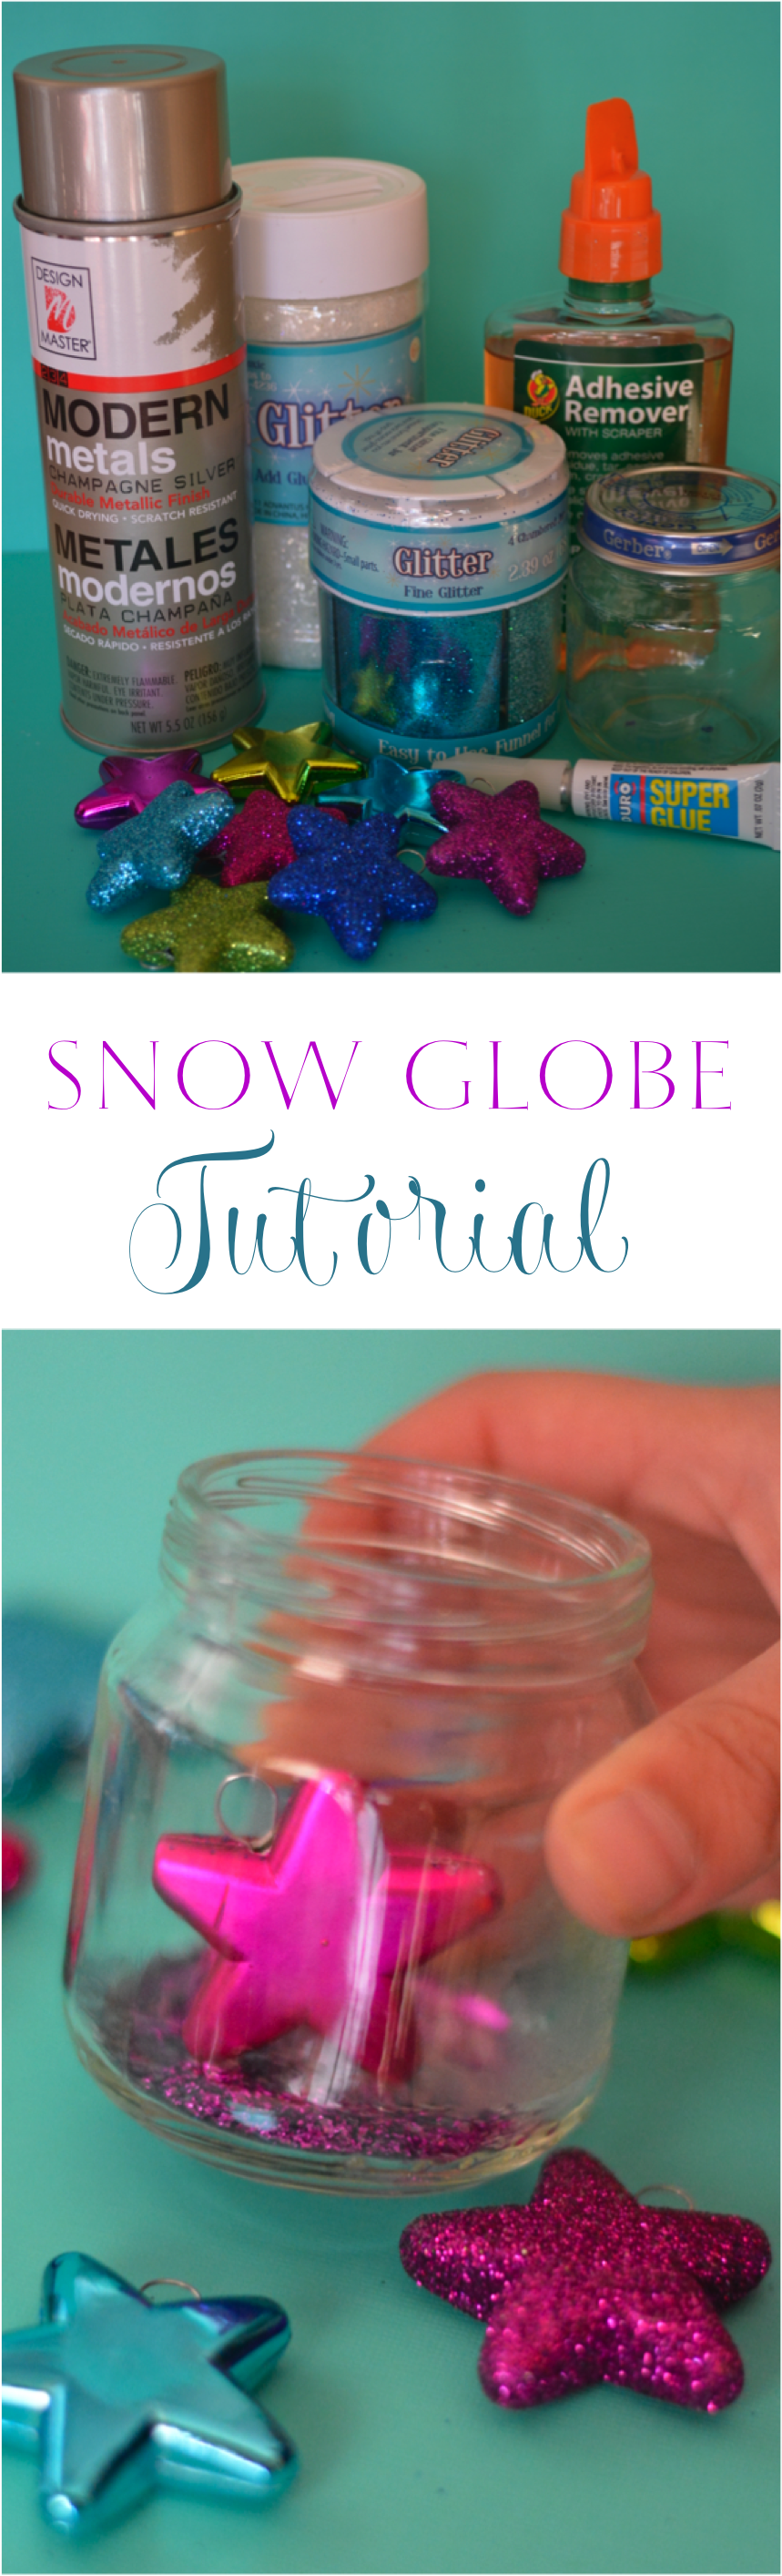 Snow Globe Tutorial for Kids